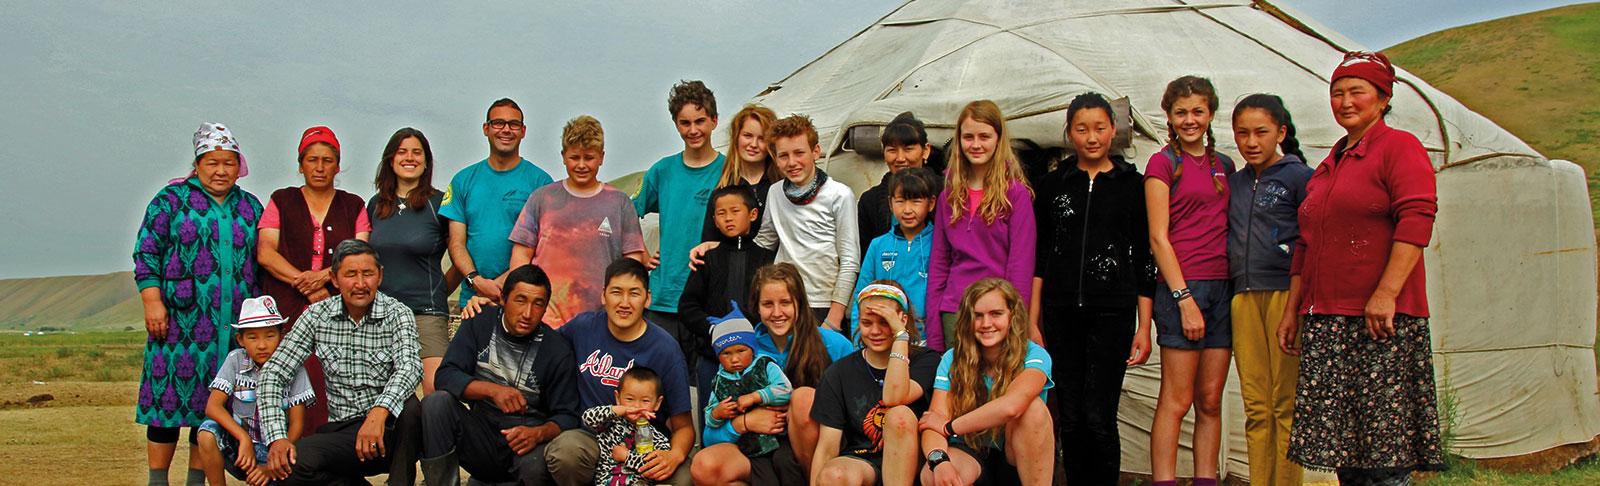 greenland group photo